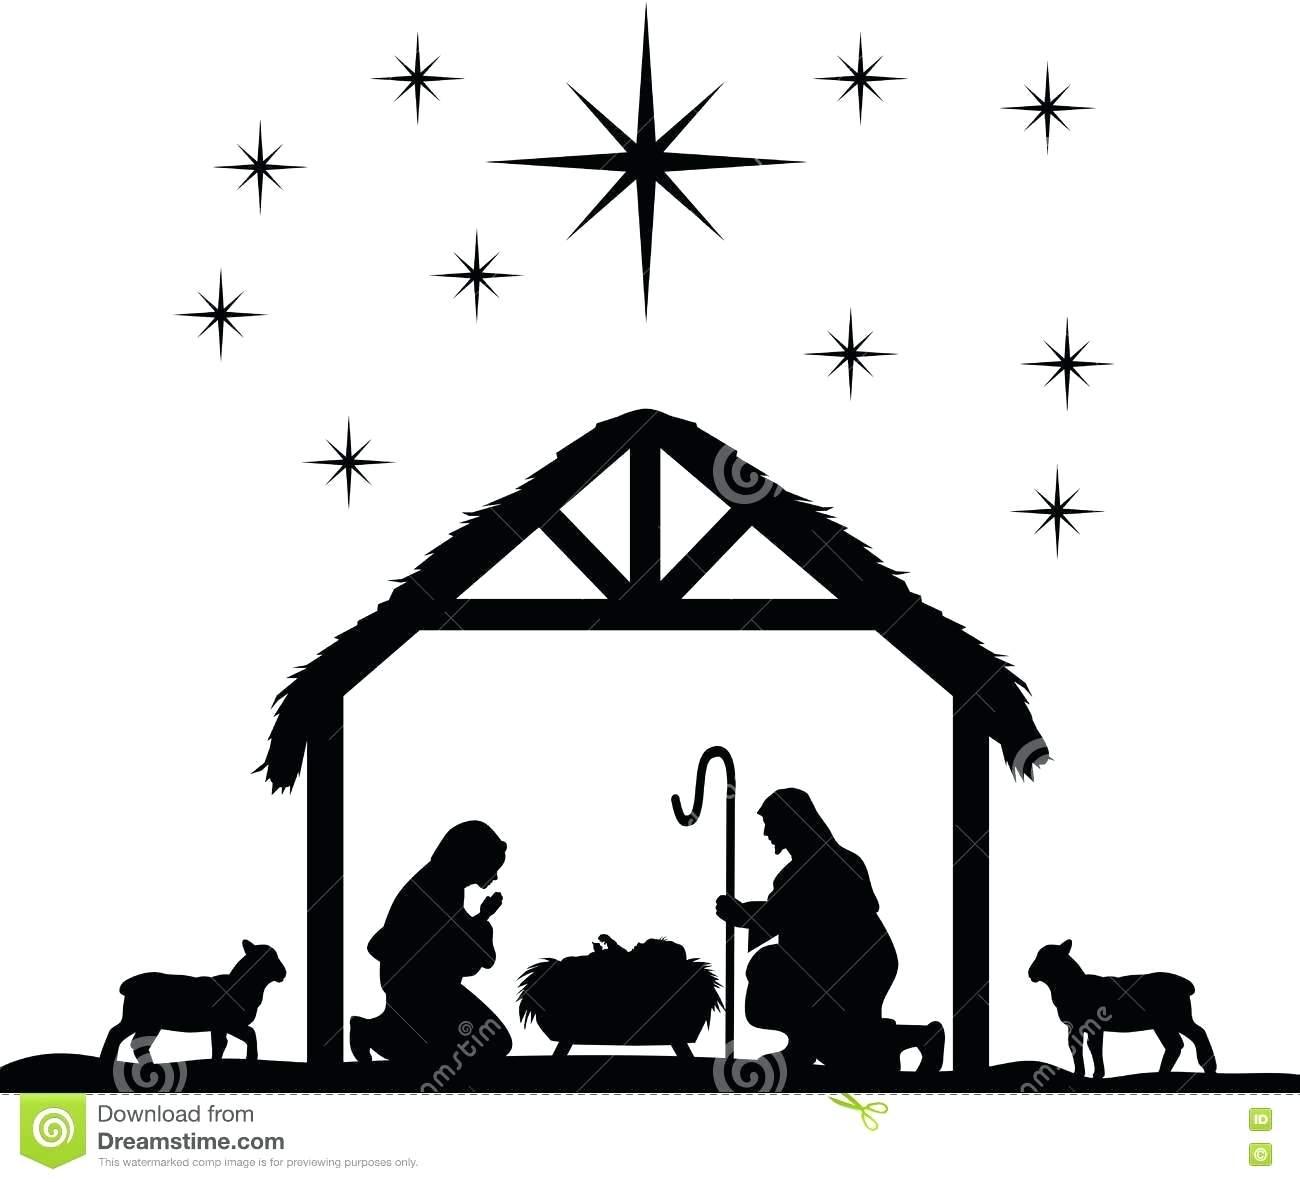 Silhouette Nativity Scene at GetDrawings.com.